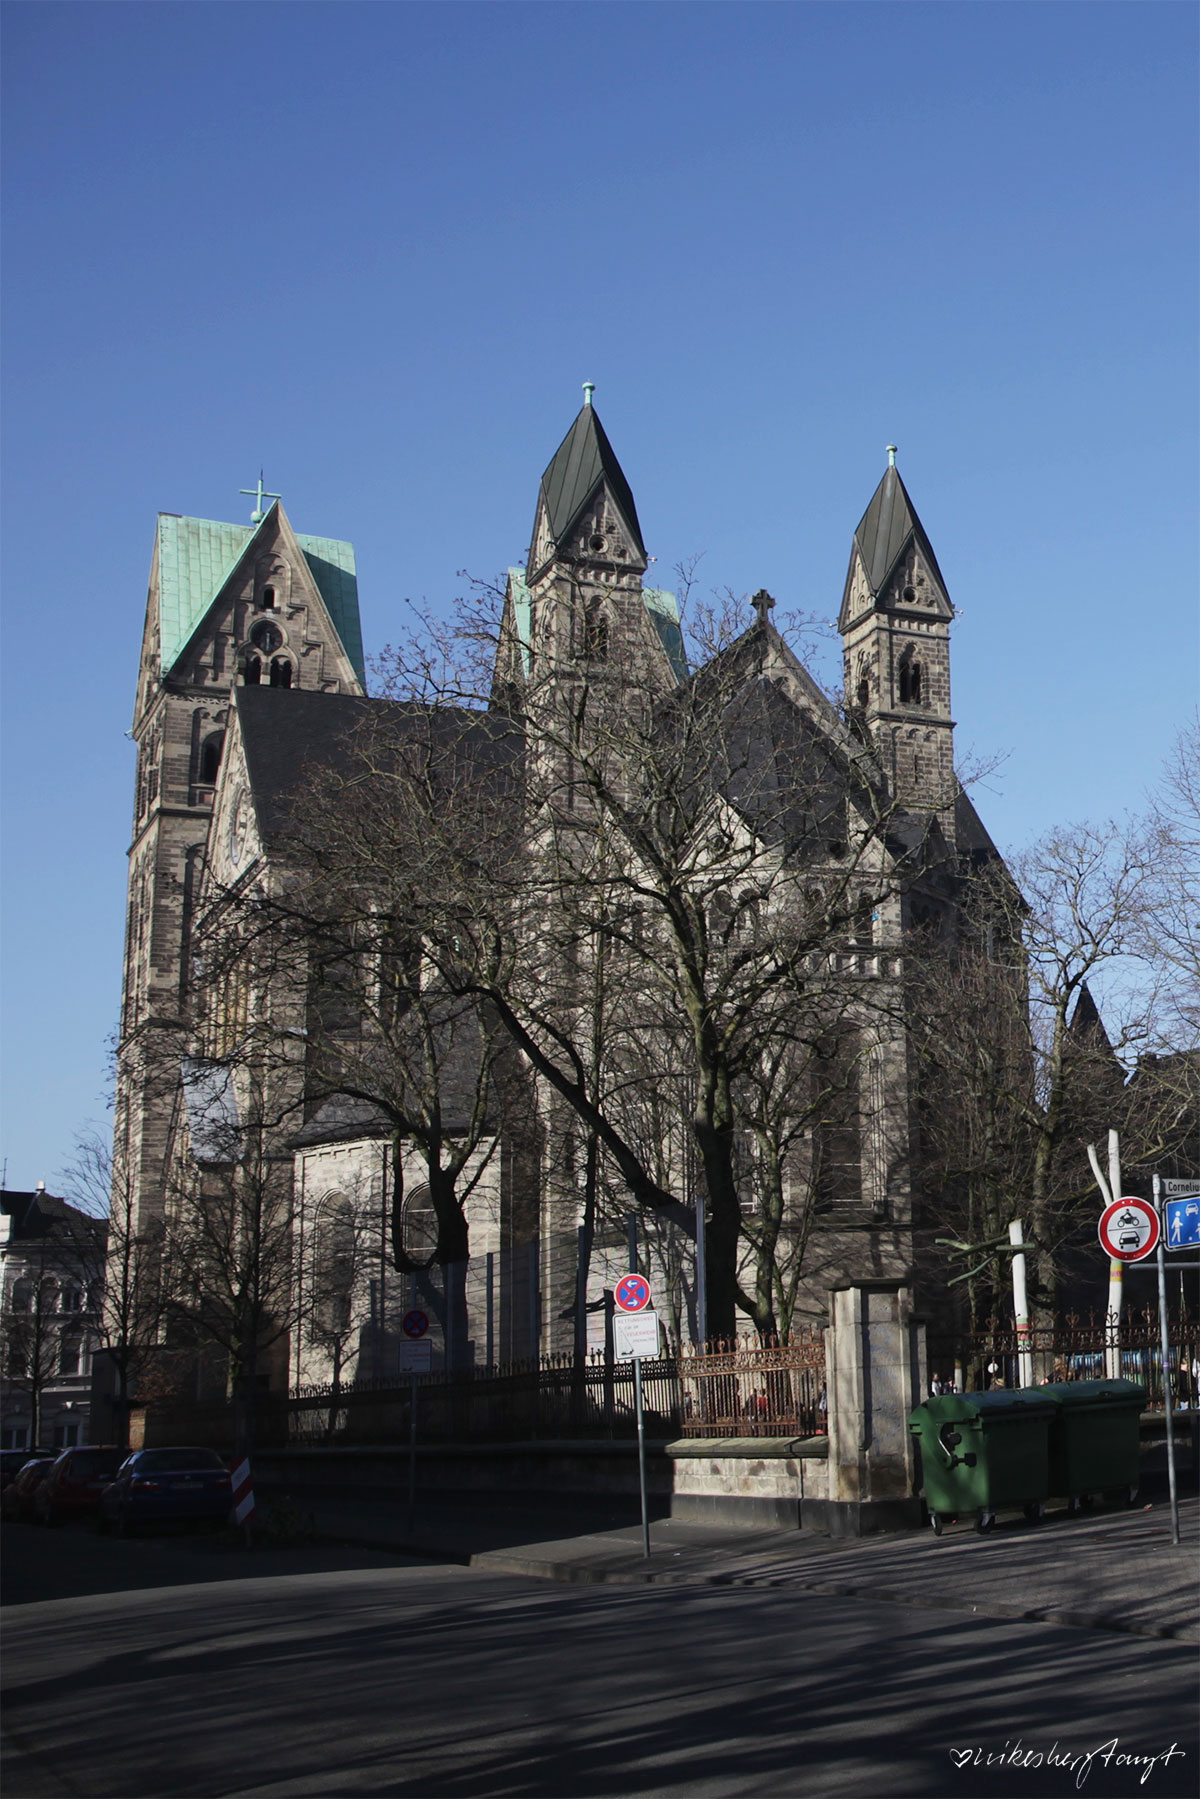 ein Tag in Krefeld, nikesherztanzt, #nikeskrefels